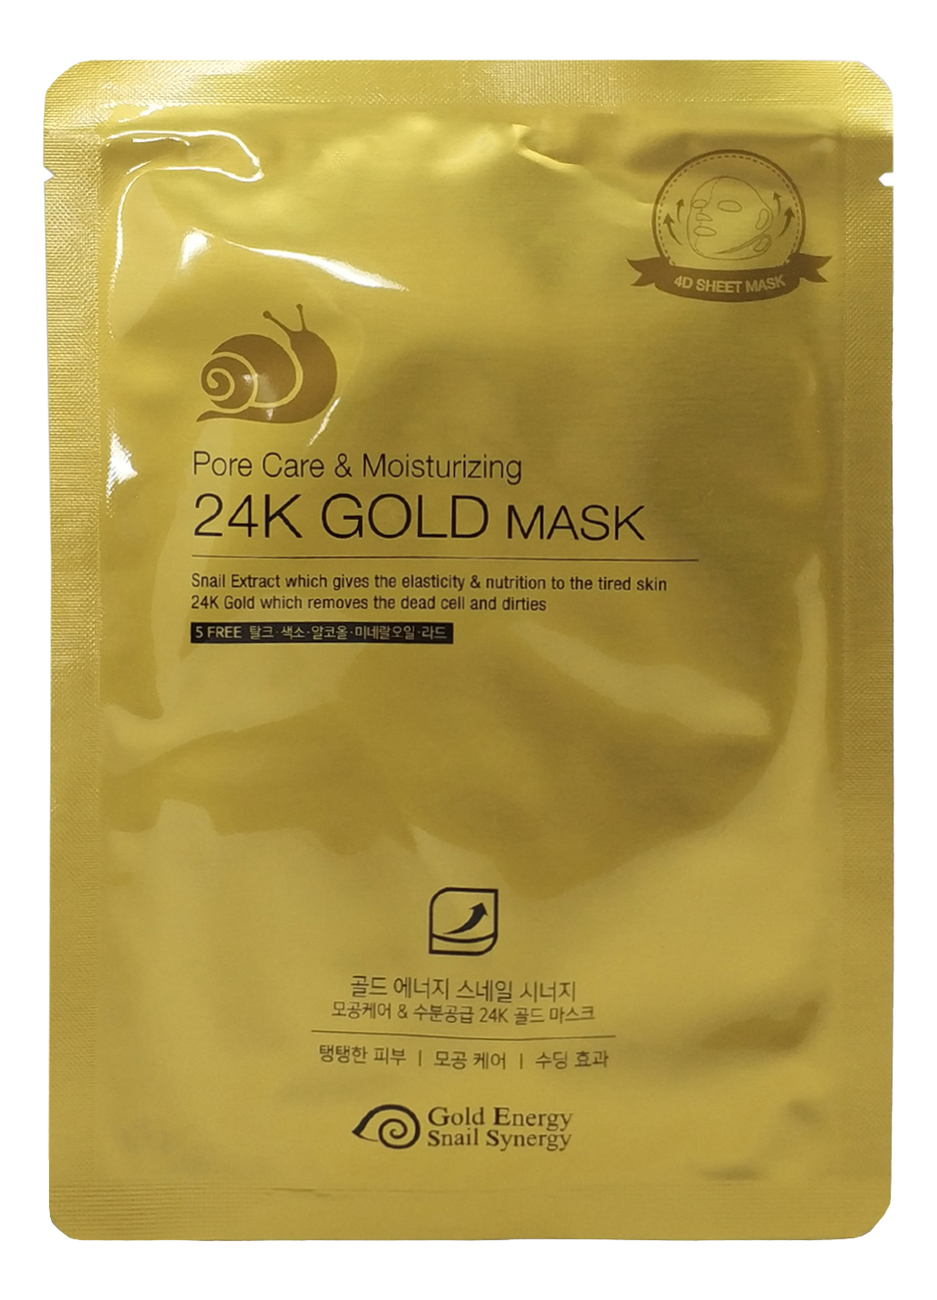 Маска для лица увлажняющая Pore Care & Moisturizing 24K Gold Mask: Маска 1шт guerlain super aqua mask увлажняющая маска super aqua mask увлажняющая маска